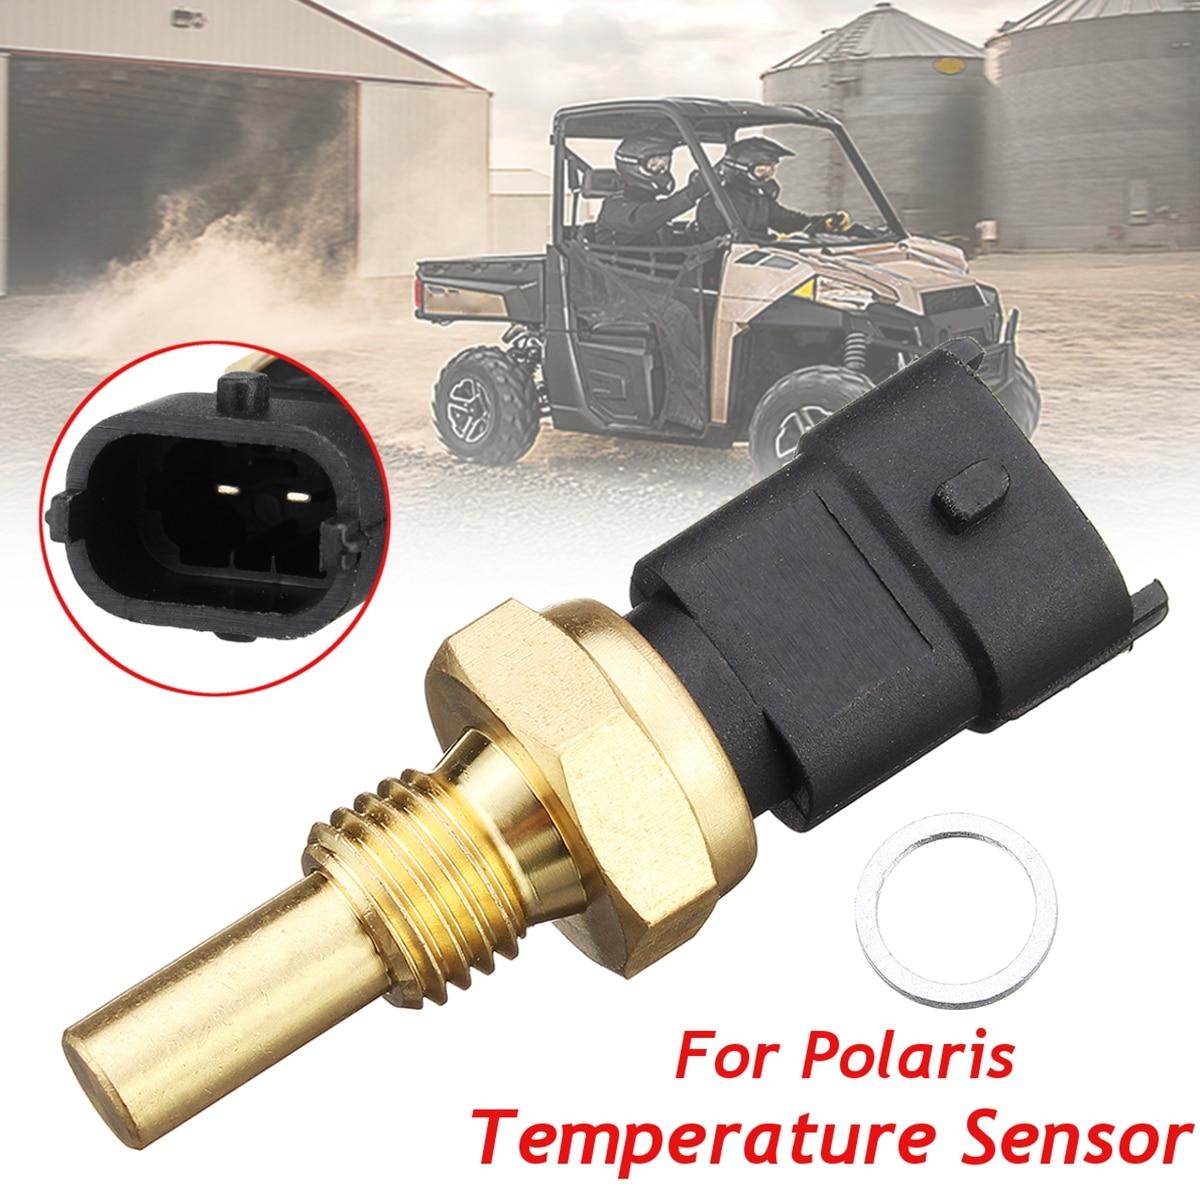 Temperature Sensor Switch For Polaris Sportsman Scrambler 2004 2005 2006 2007 2008 2009 2010 2011 2012 2013 2014 - 2017 4010644